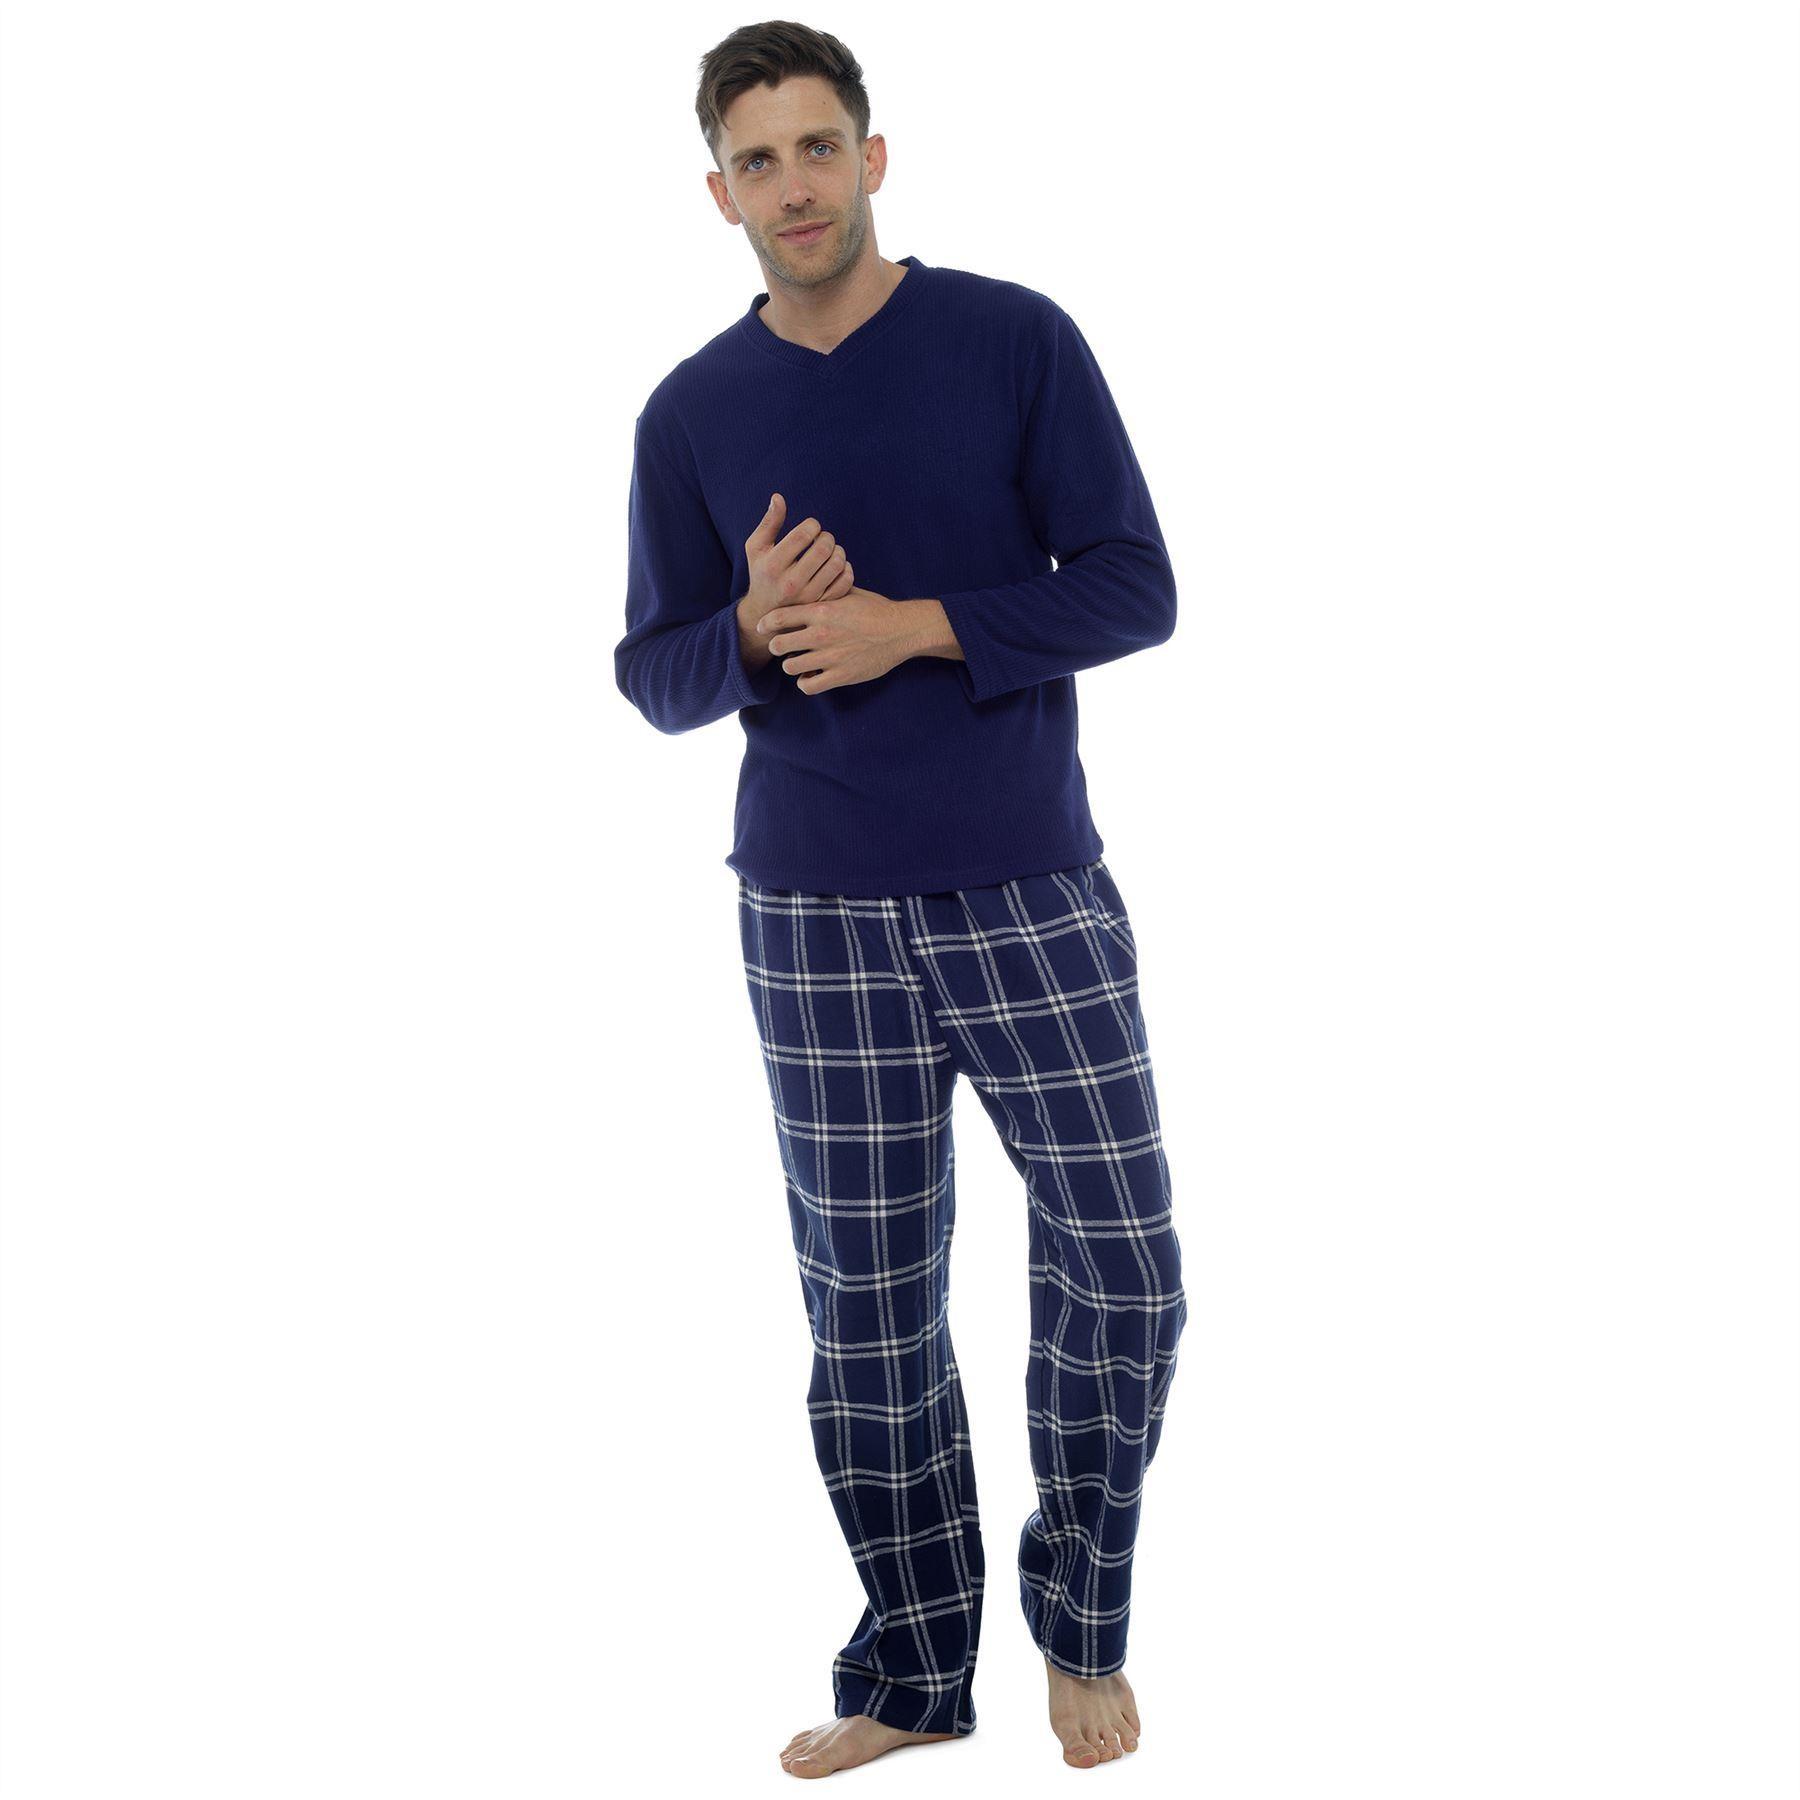 Tom Franks Mens Fleece/Flannel Check Pyjama Set - Navy